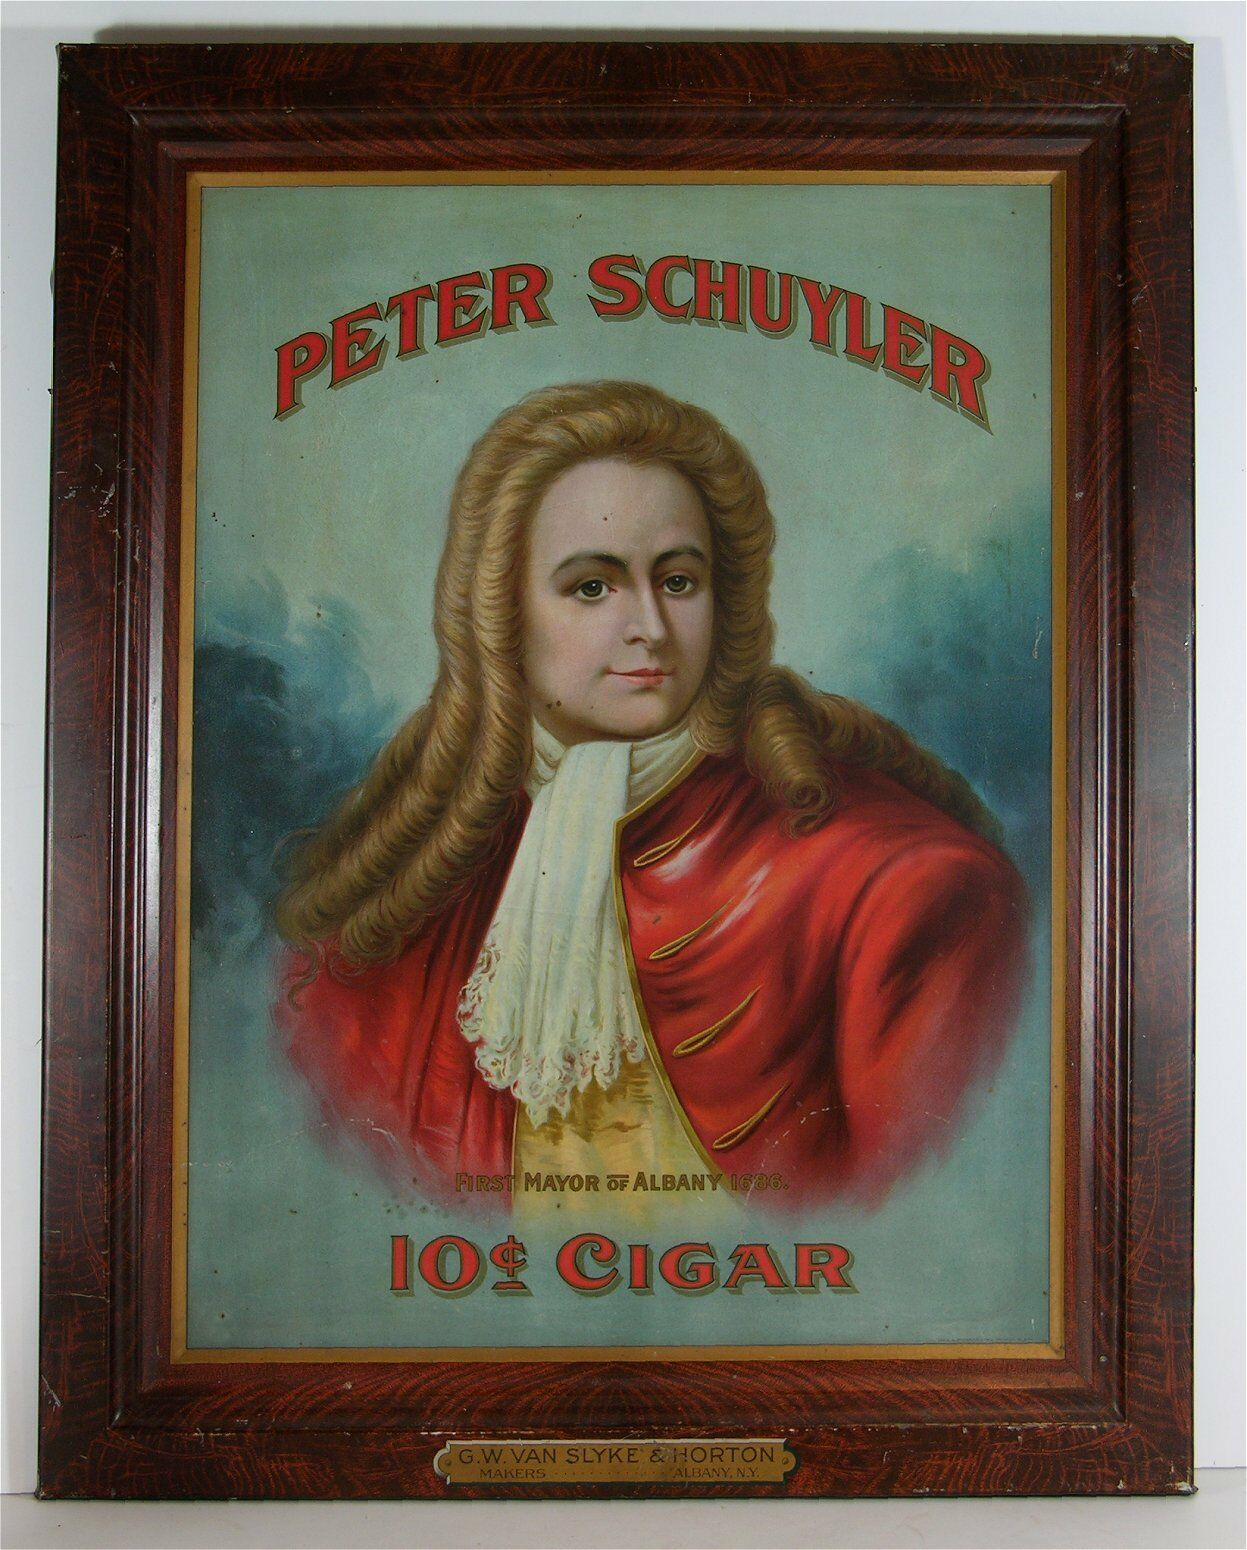 Peter Schuyler 10ct Cigar Self Framed Tin Sign, Albany, N.Y.